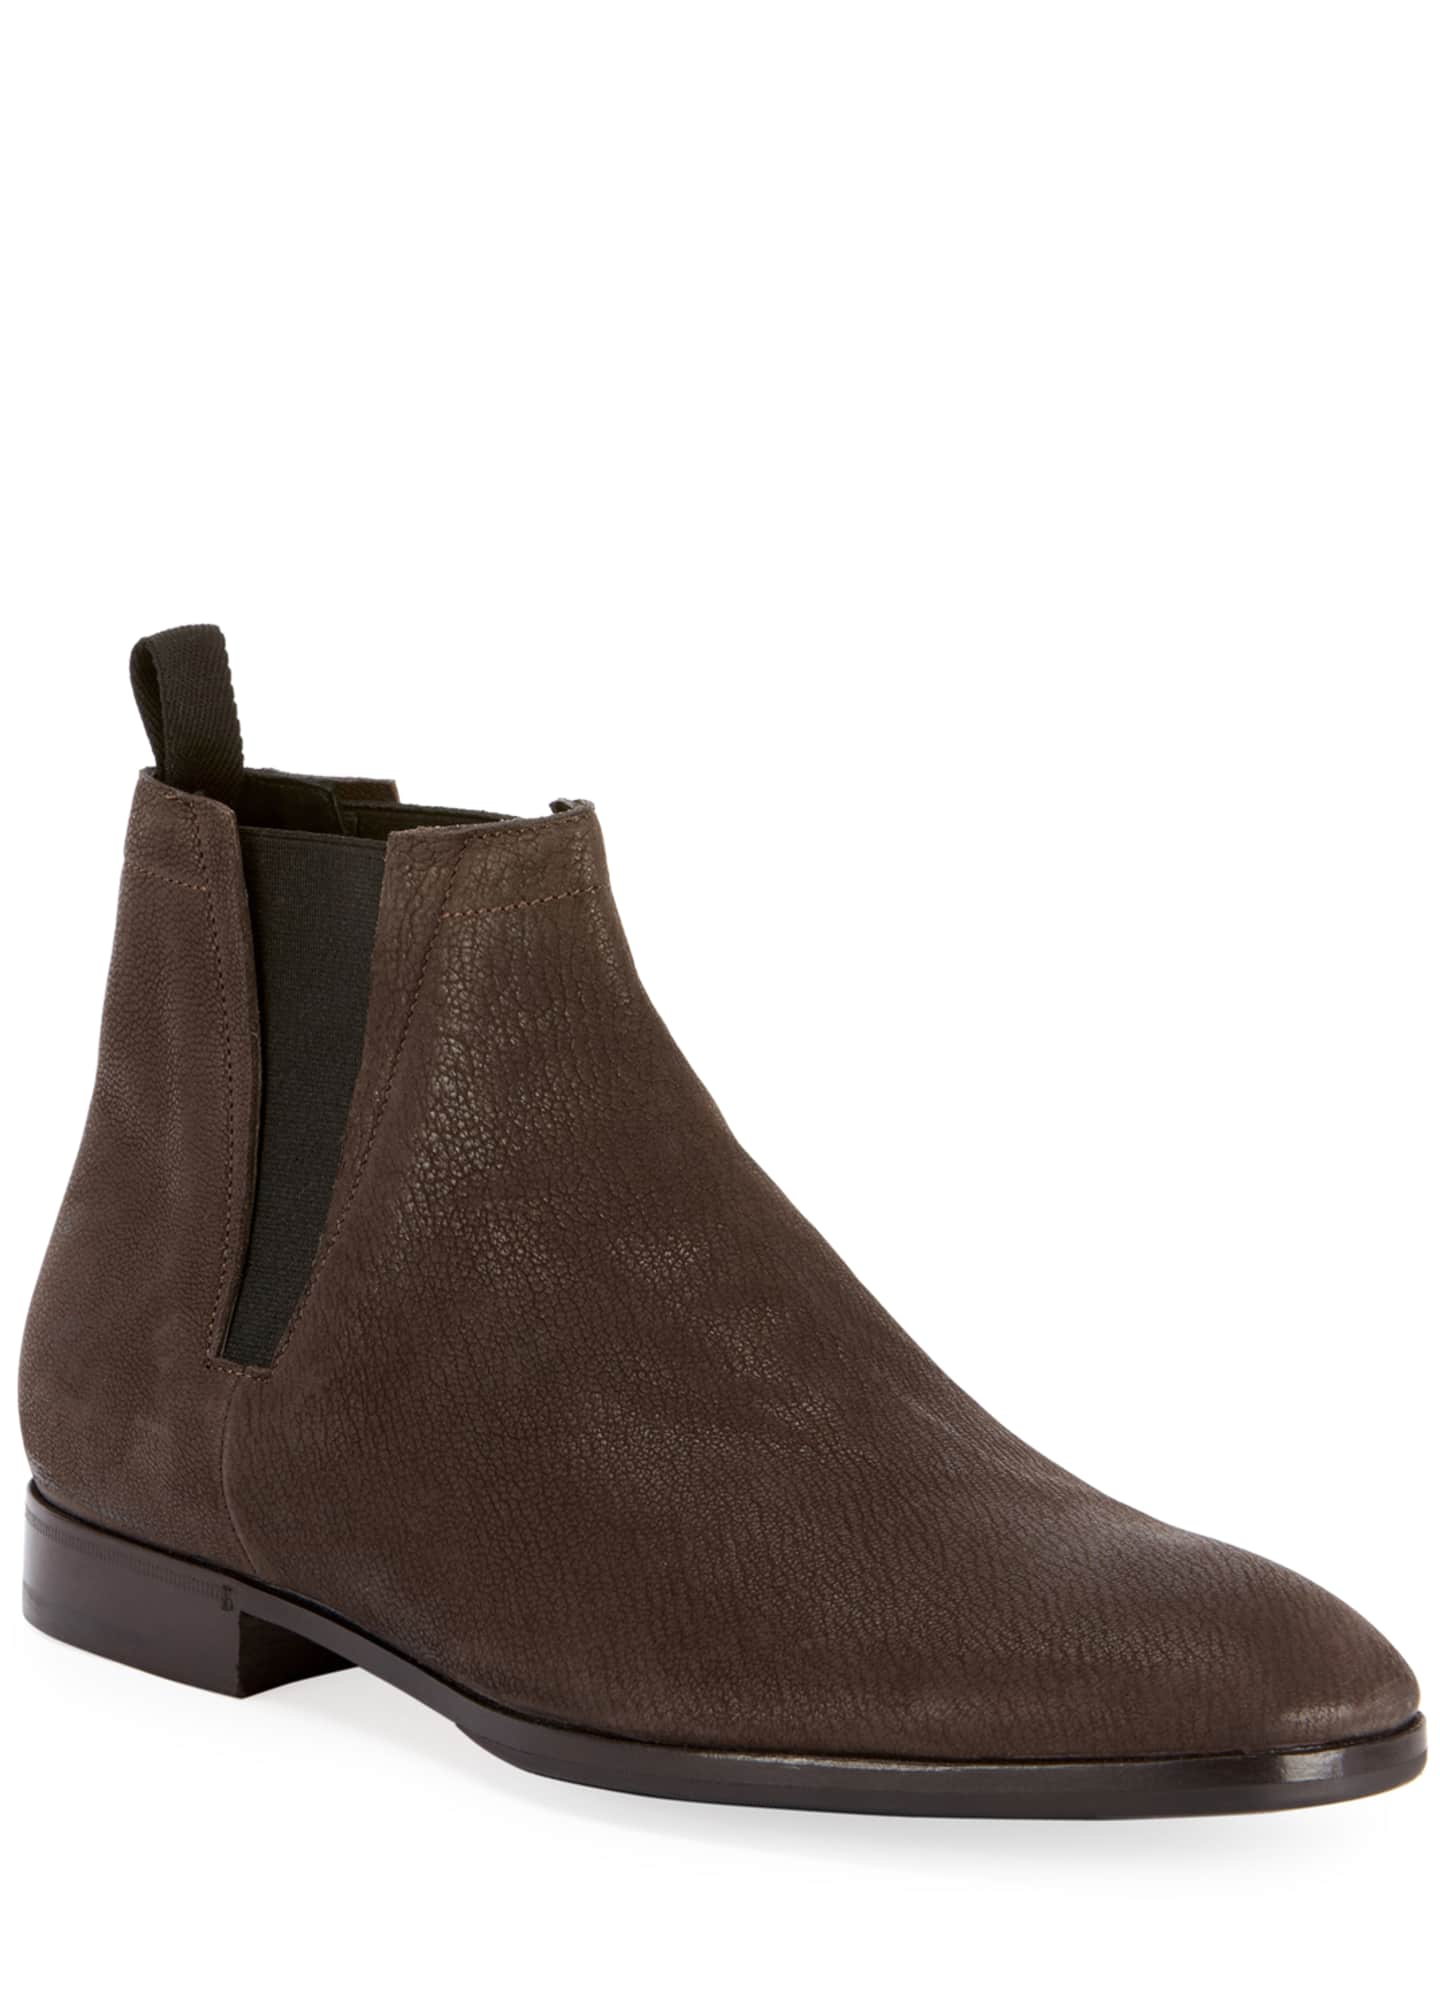 Berluti Men's Caractere Eclair Calf Suede Leather Boot